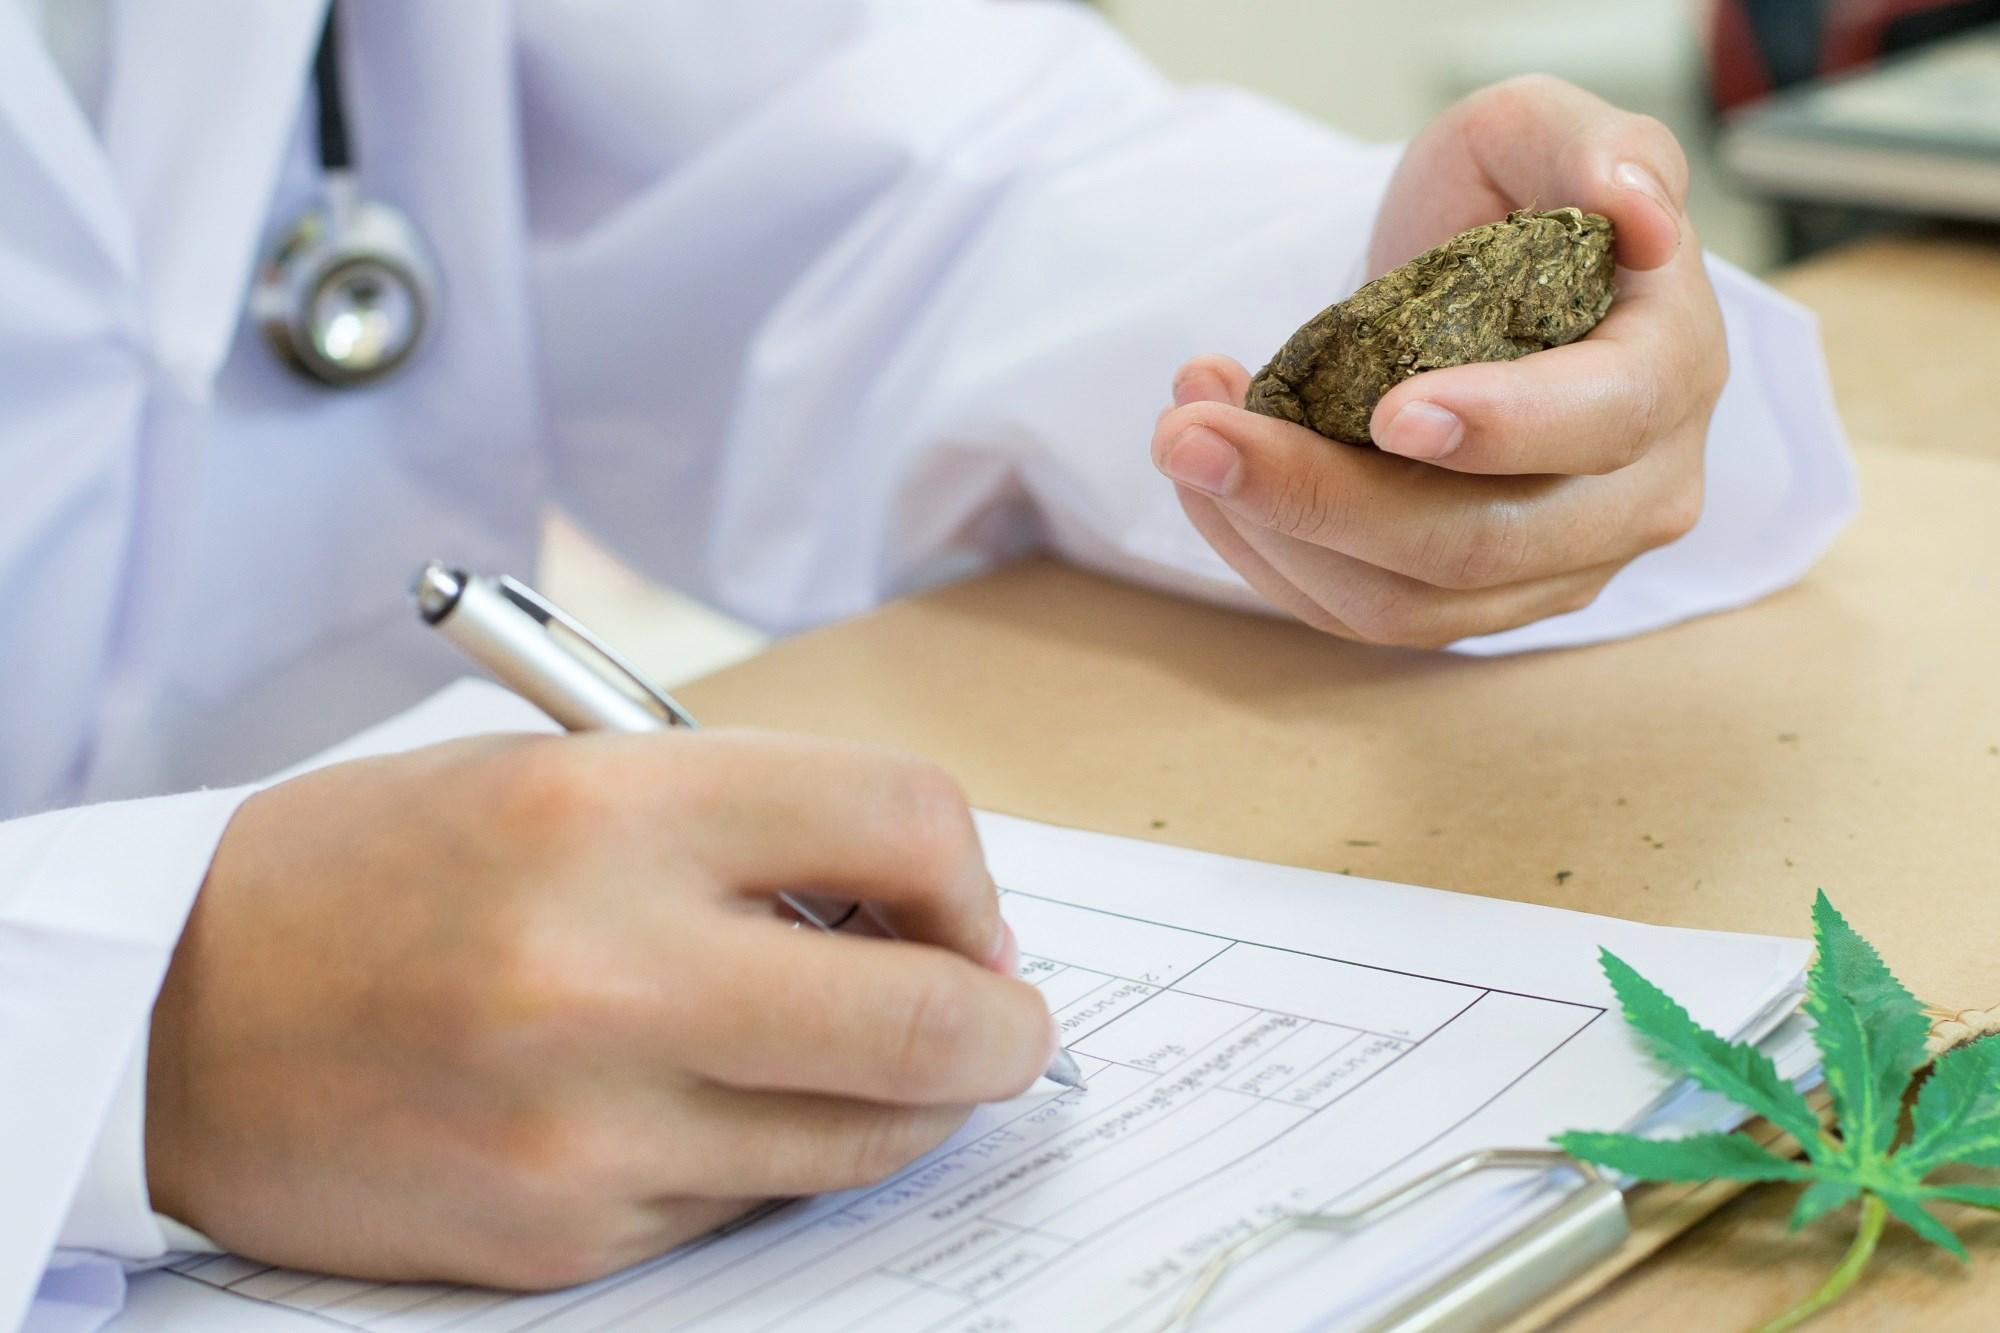 Exploring the Clinical Implications of Cannabinoid Use in Rheumatoid Arthritis